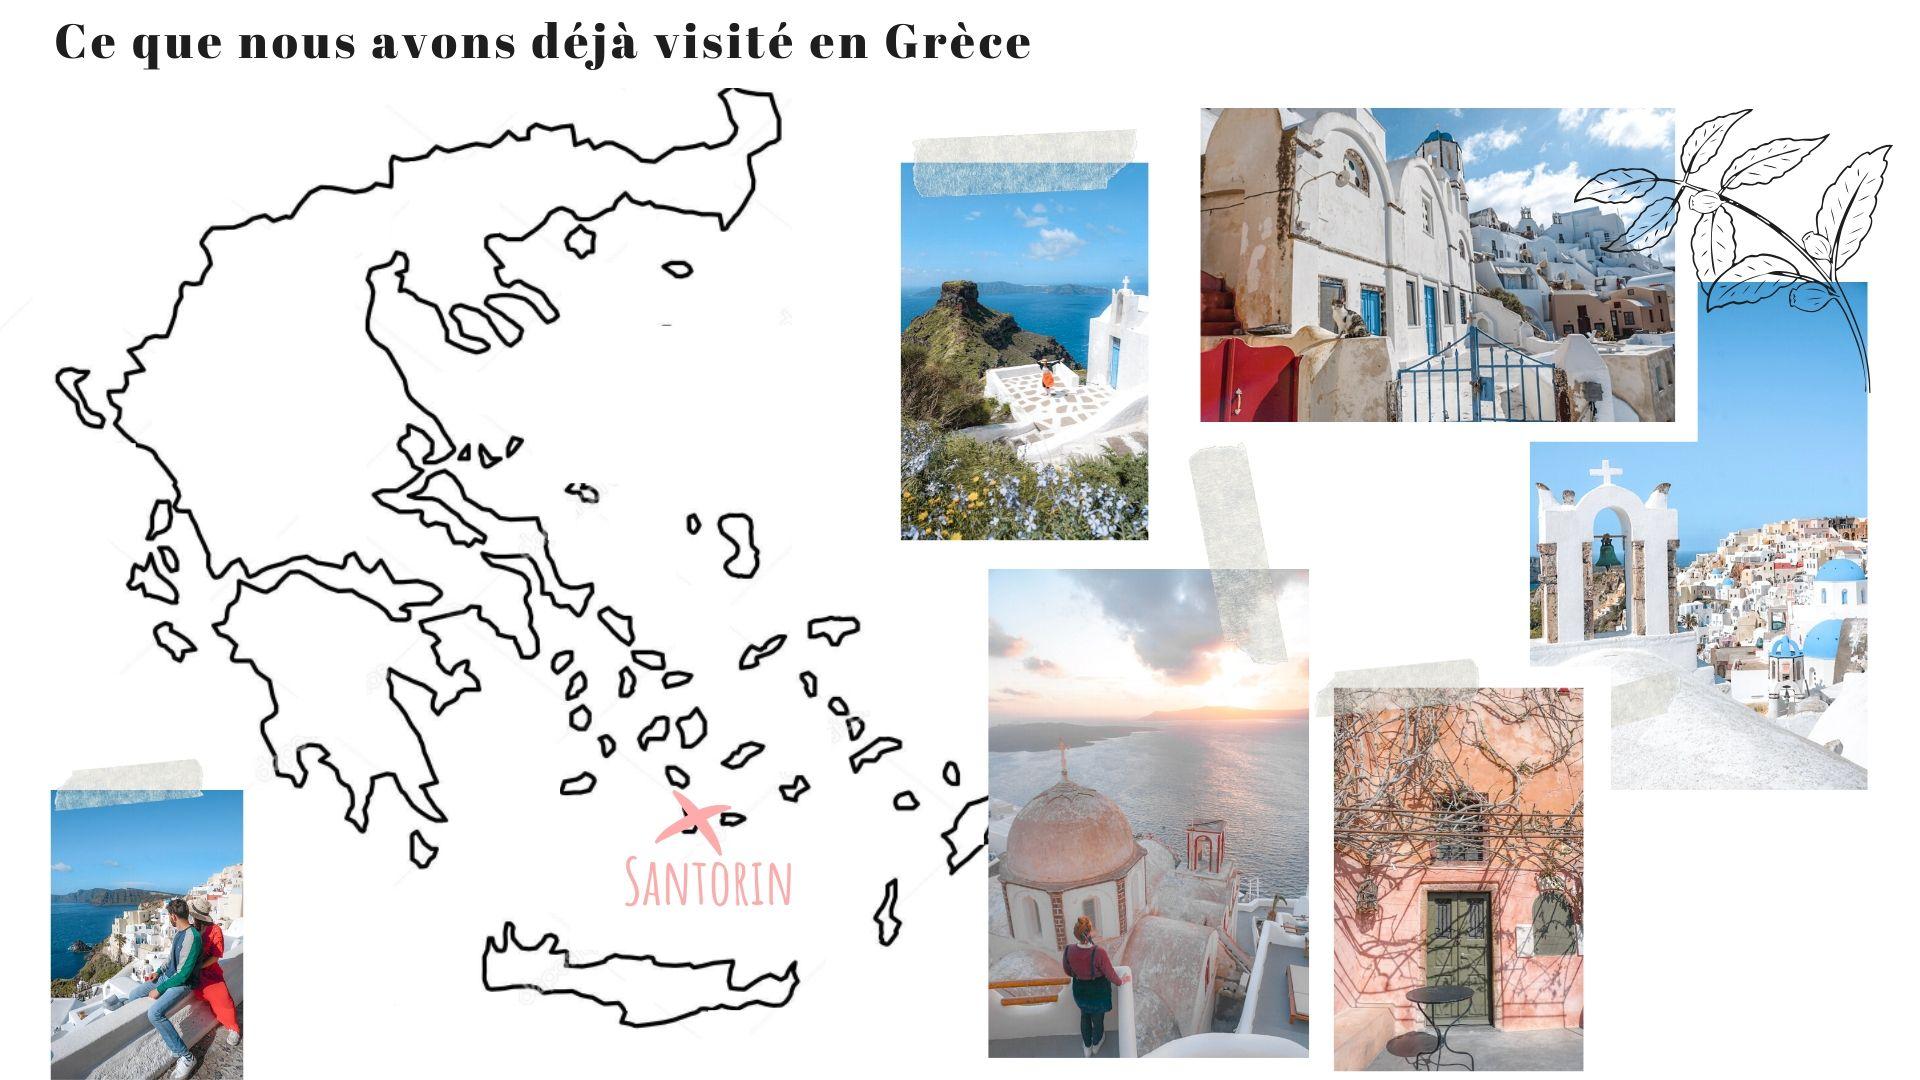 visiter grece santorin iles